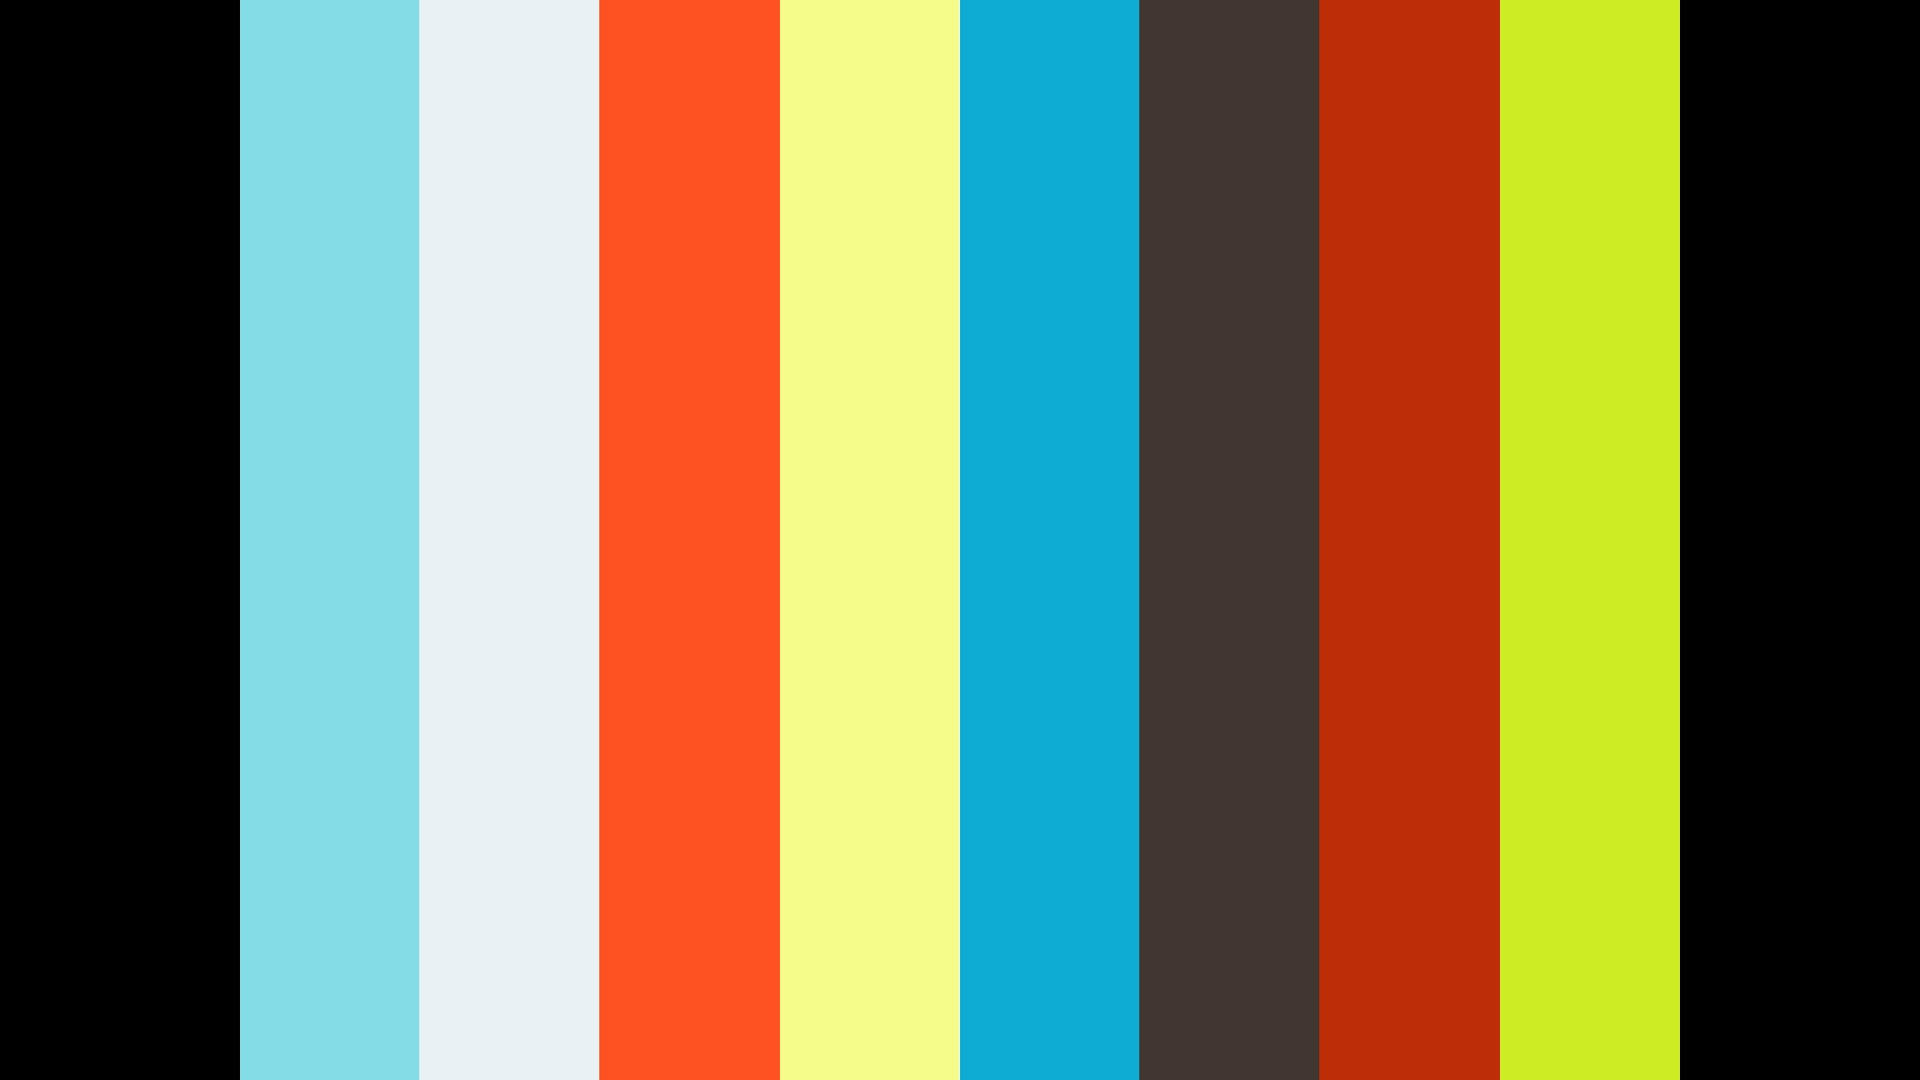 EP 280: DevSecOps & OpenShift w Kirsten Newcomer, Red Hat